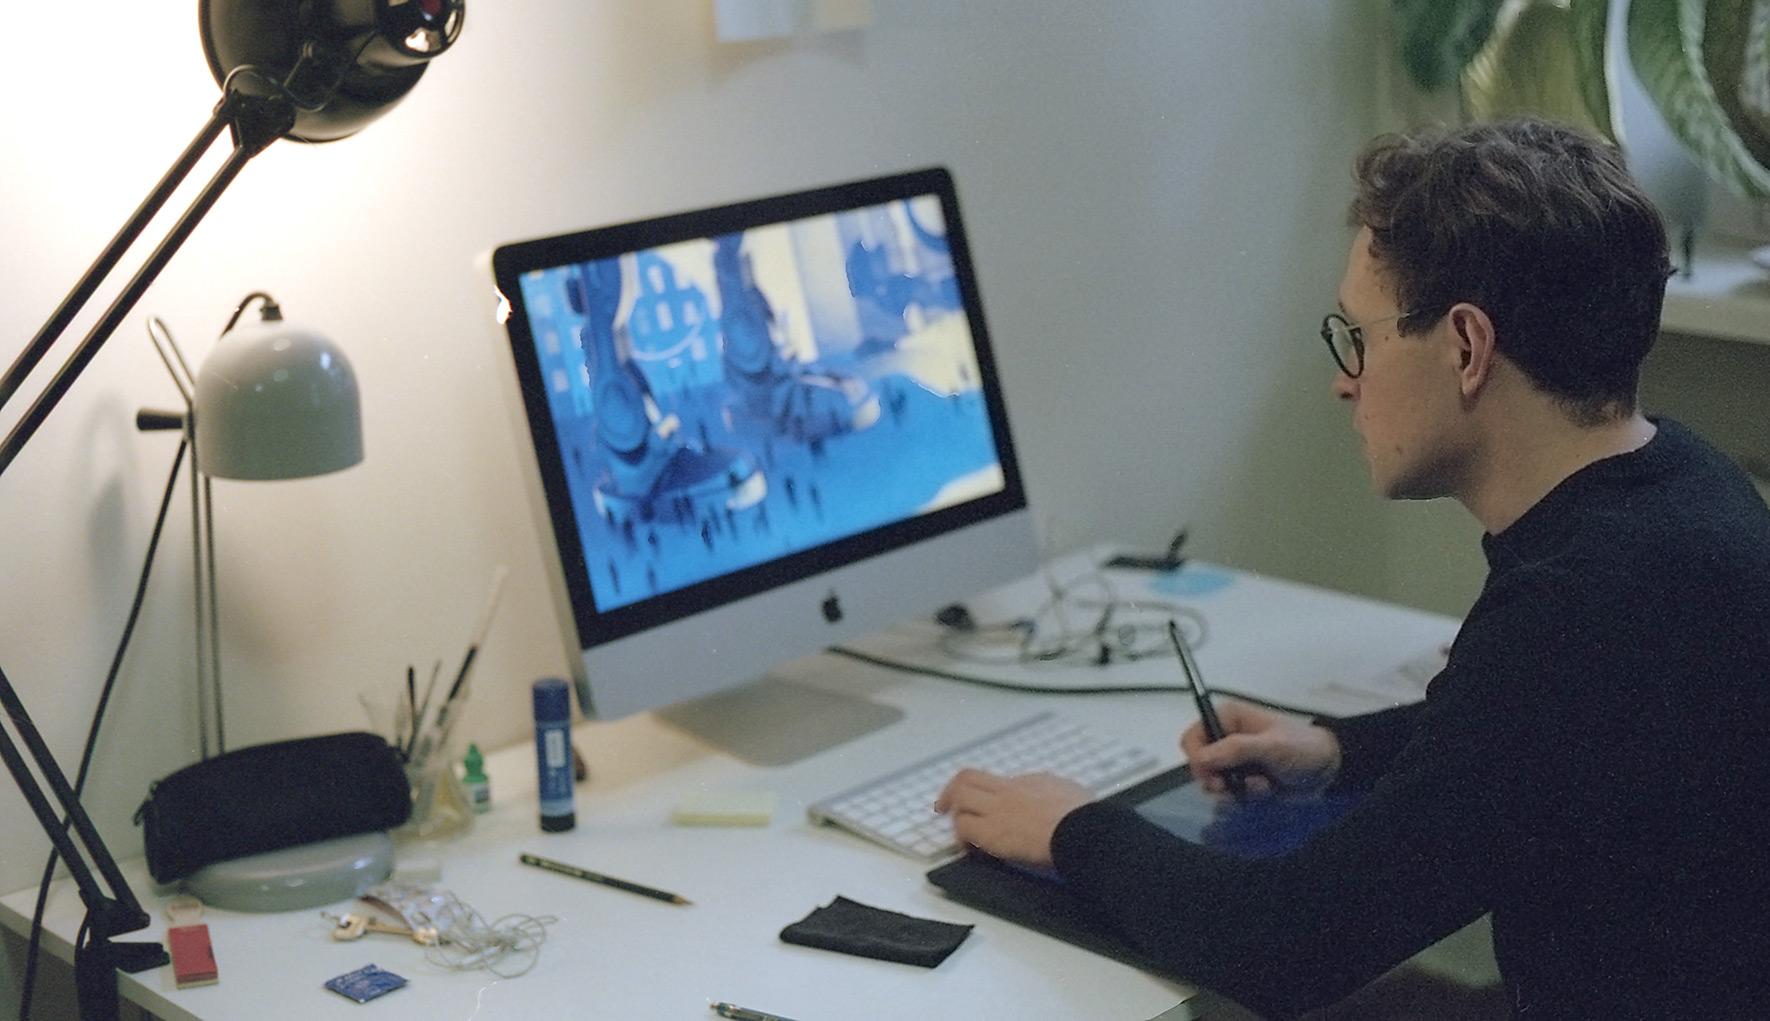 Karolis has recently upgraded to a 27' iMac.